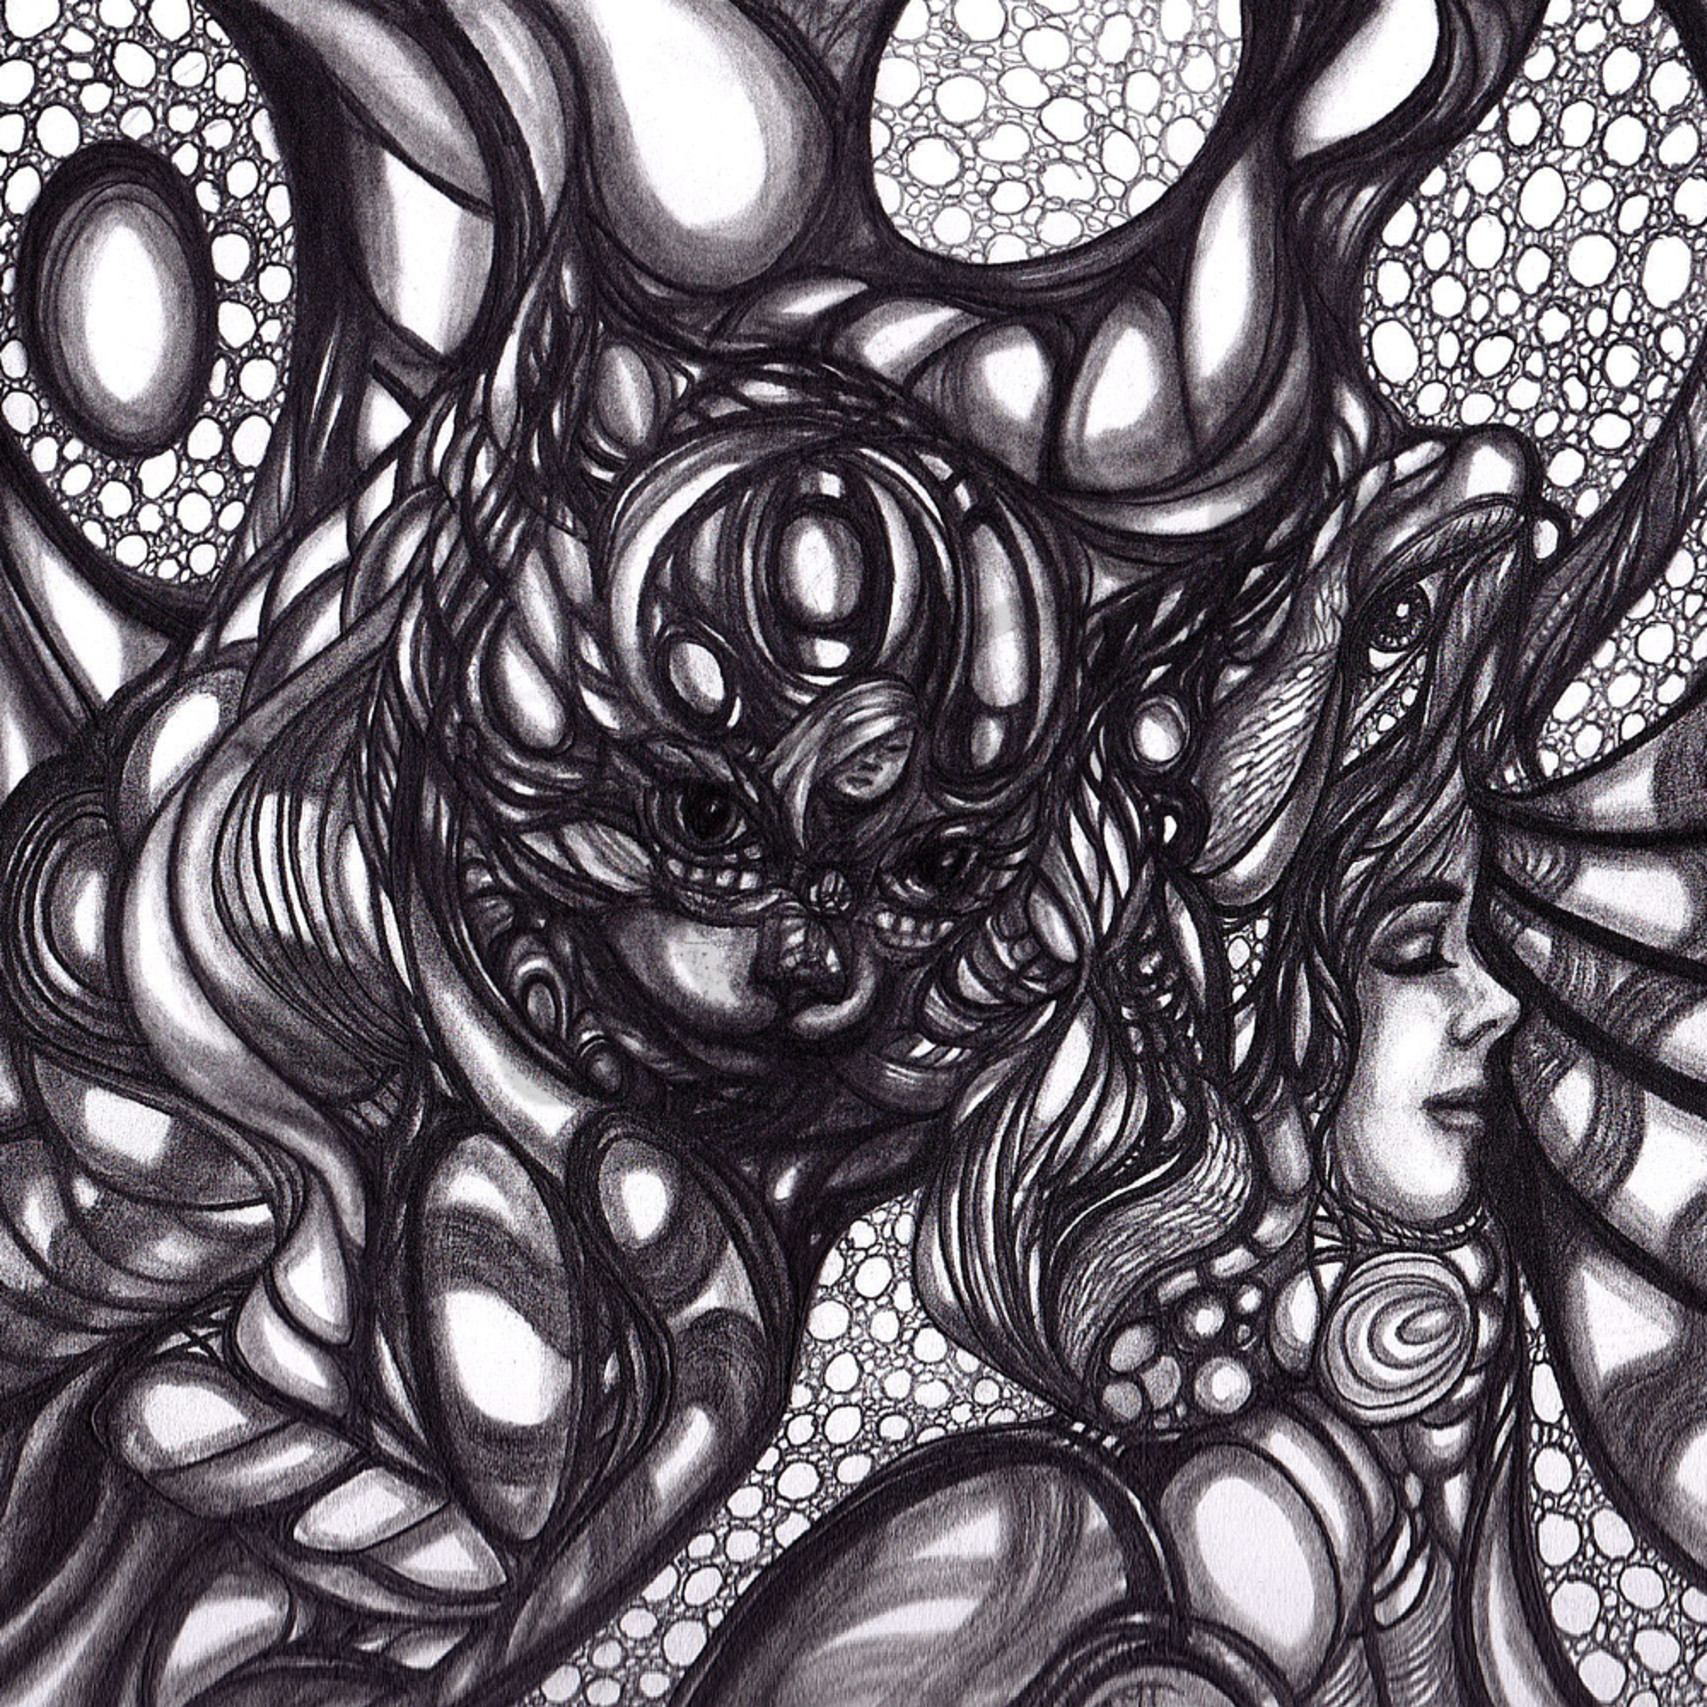 Seriouslypsychedelic imbbnm